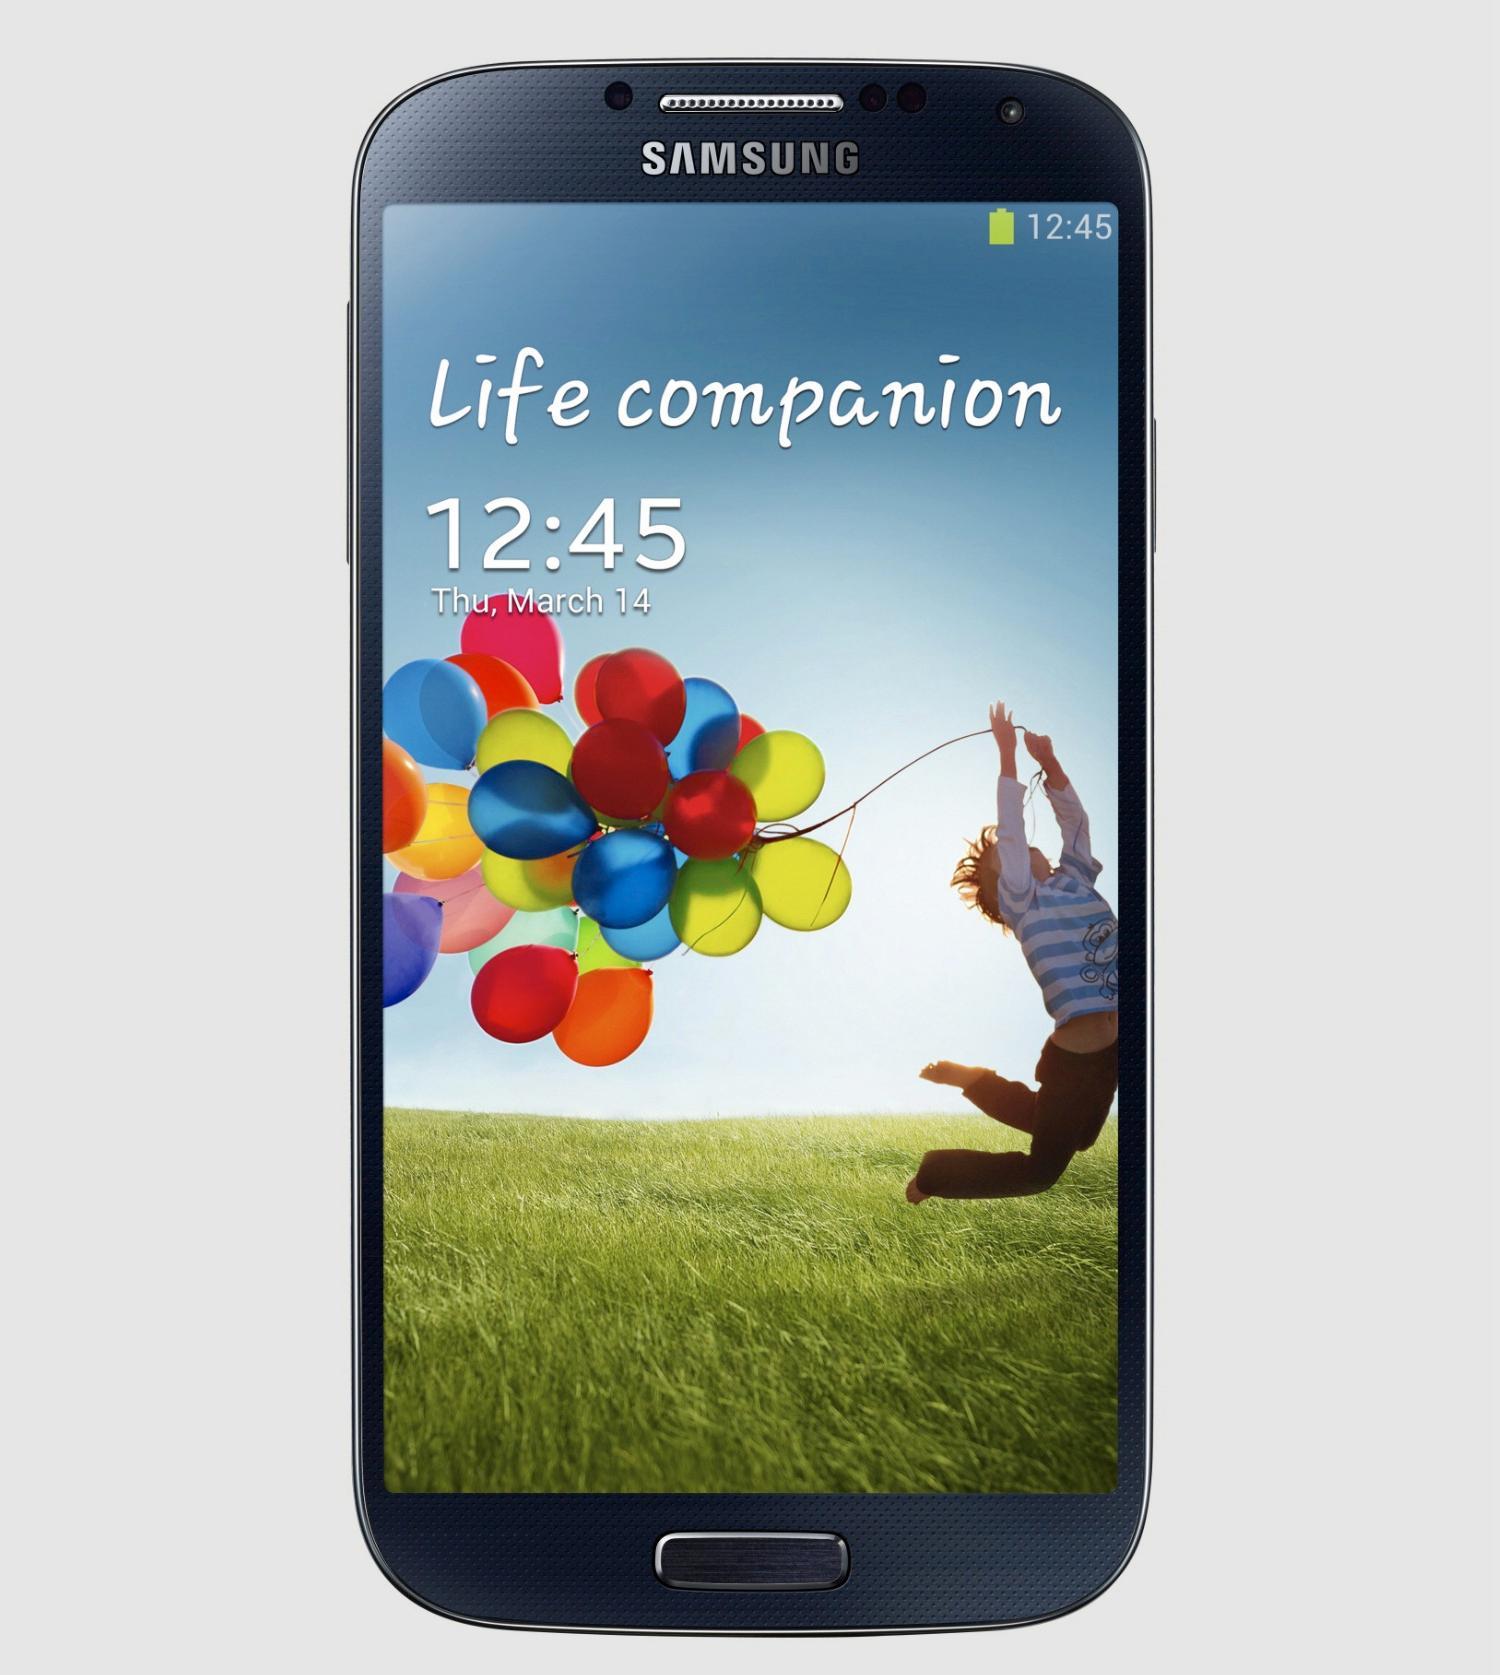 Samsung Galaxy S4 er bygget i en slitesterk plastvariant kalt polykarbonat.Foto: Samsung